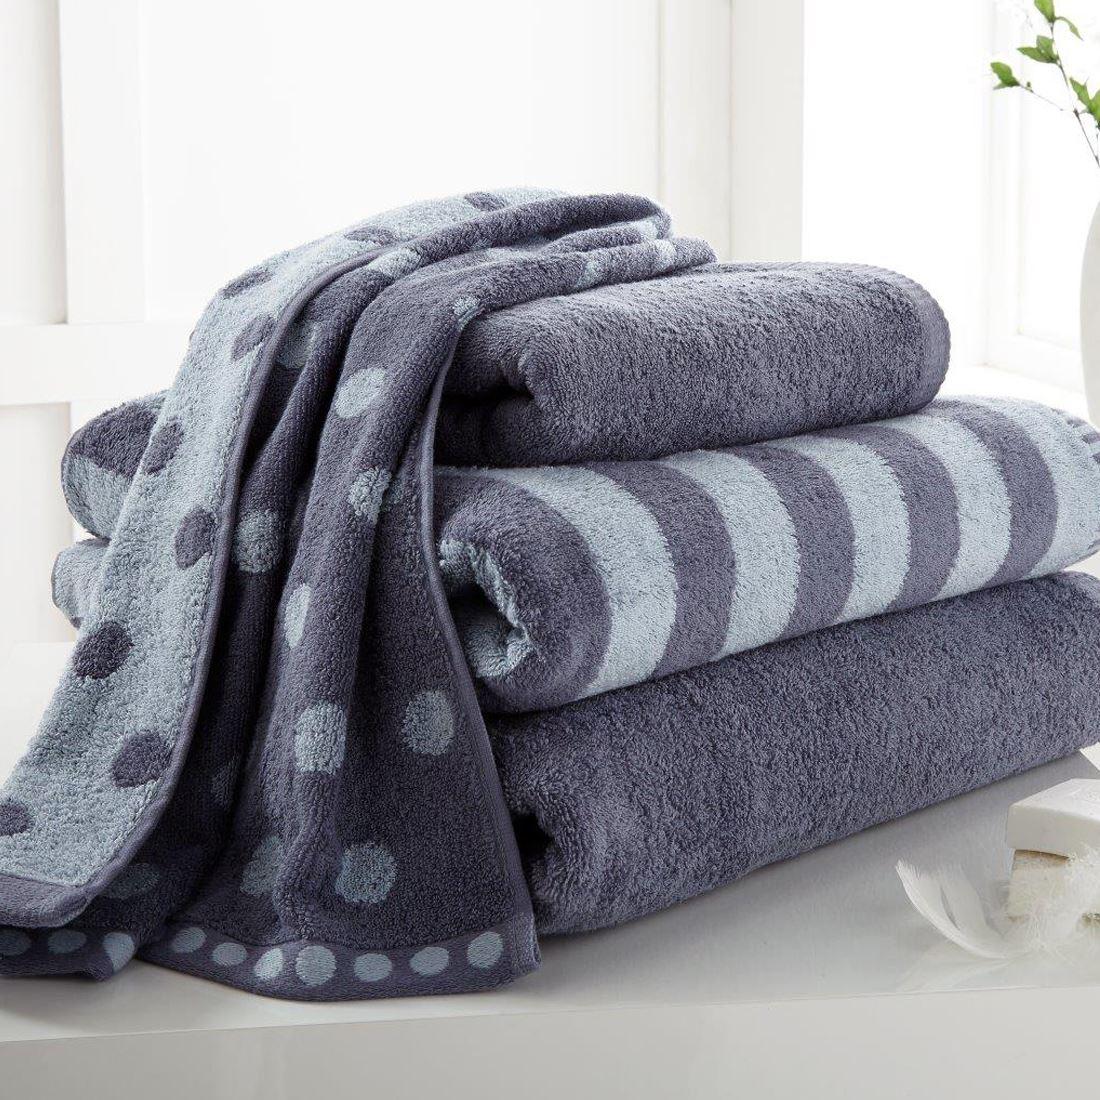 Polka Dot Amp Stripe 4 Pcs Bale Set Hand Towel Bath Towel